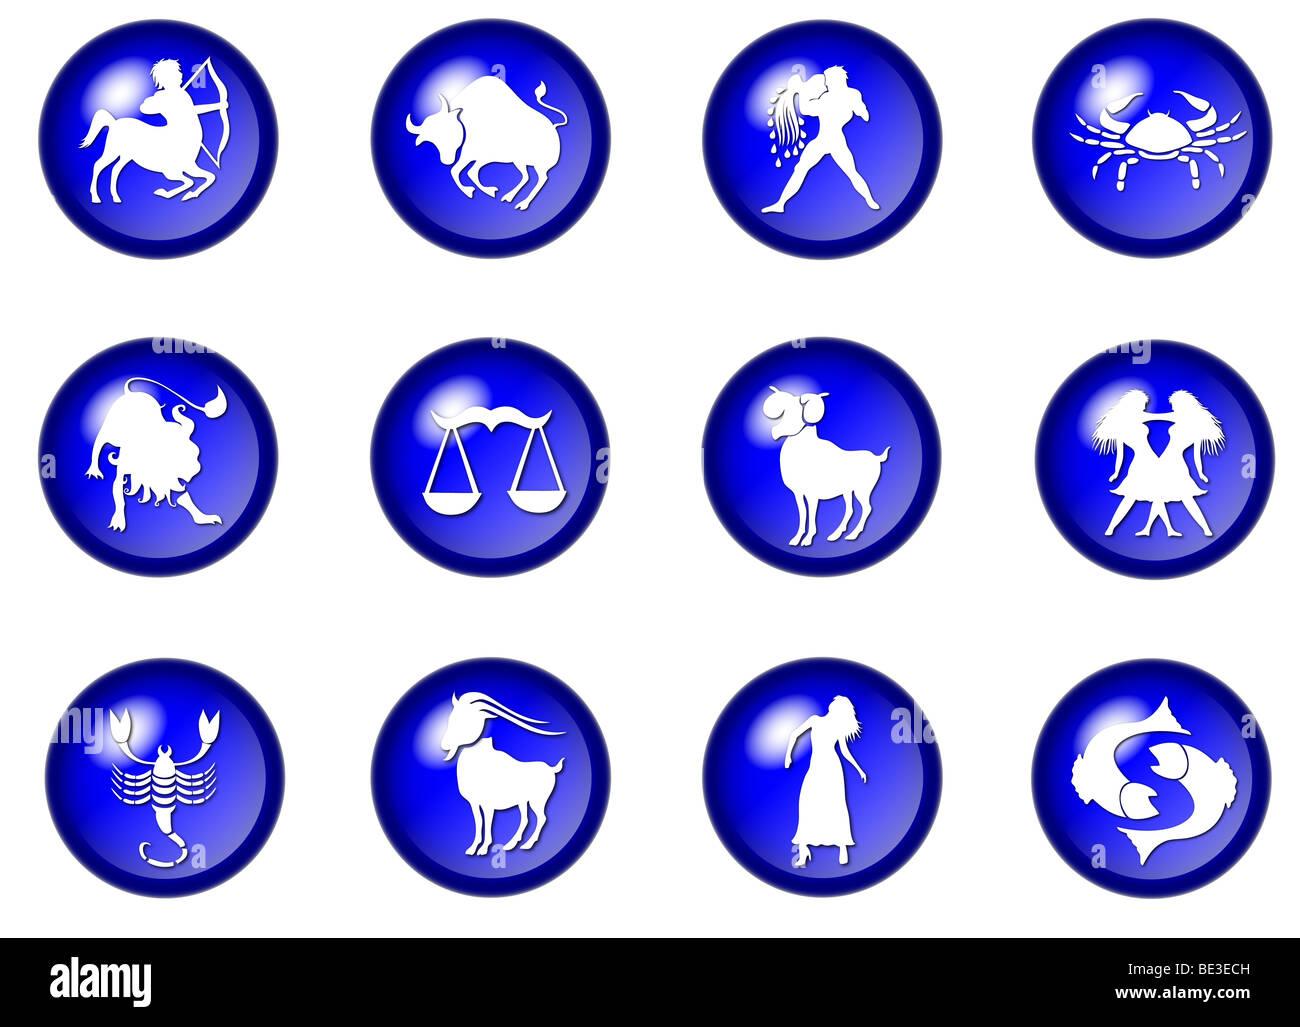 illustration of 12 blue zodiac web buttons - Stock Image